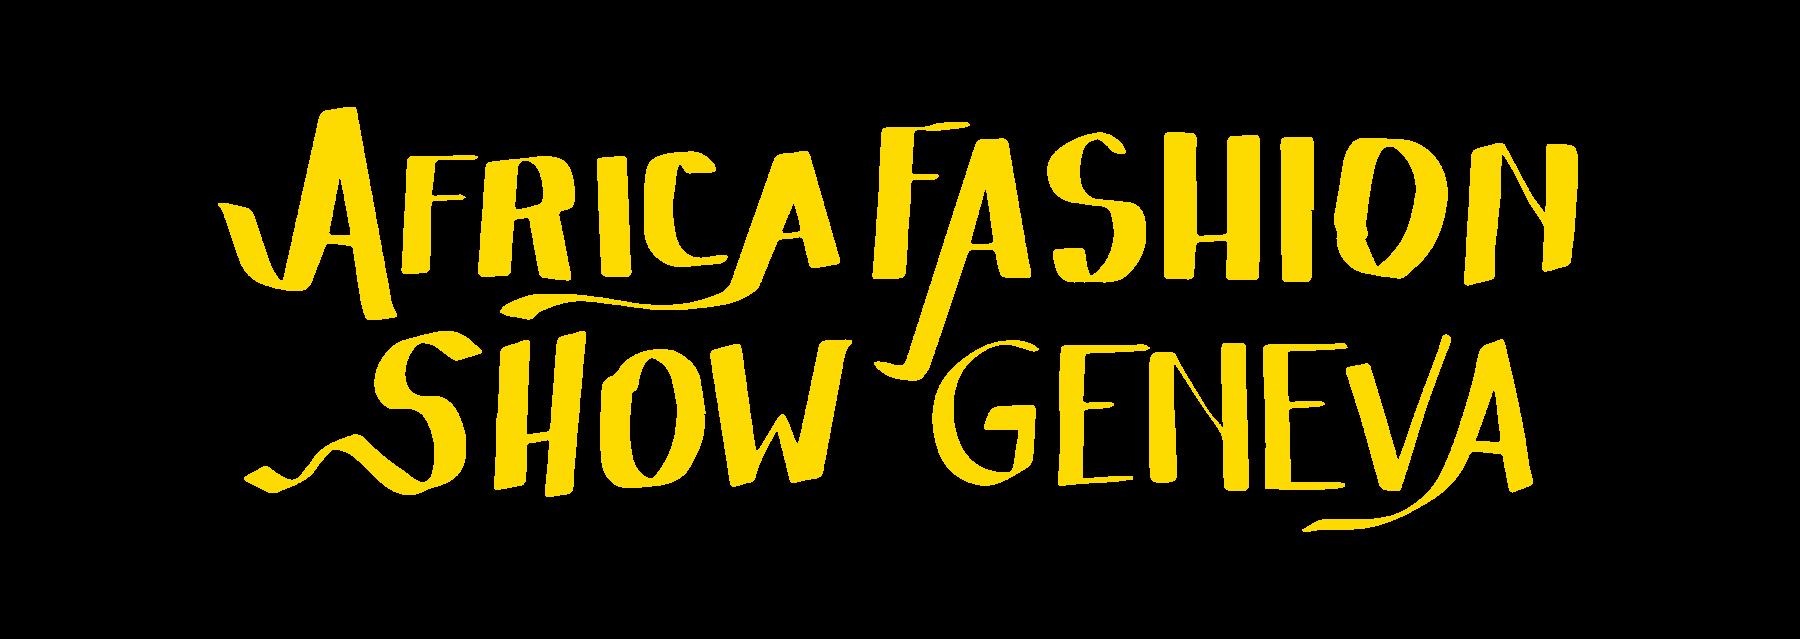 Africa Fashion show geneve - Blossom